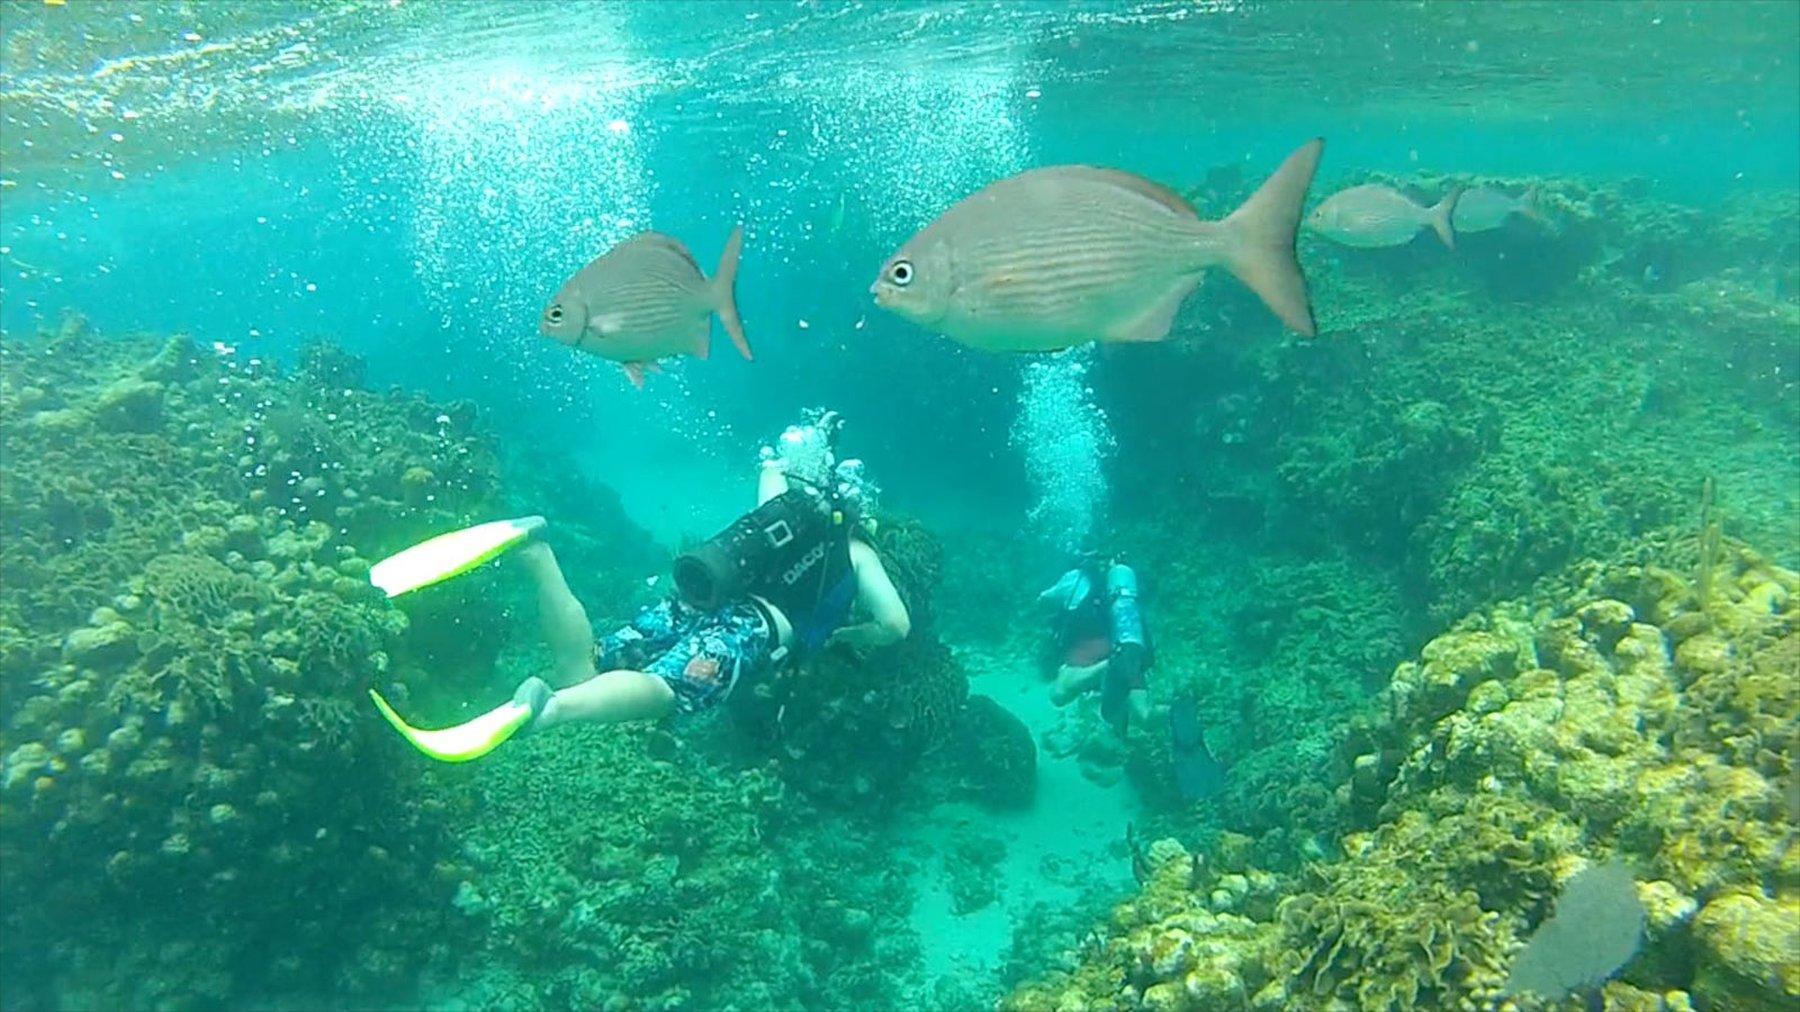 man scuba diving in the ocean